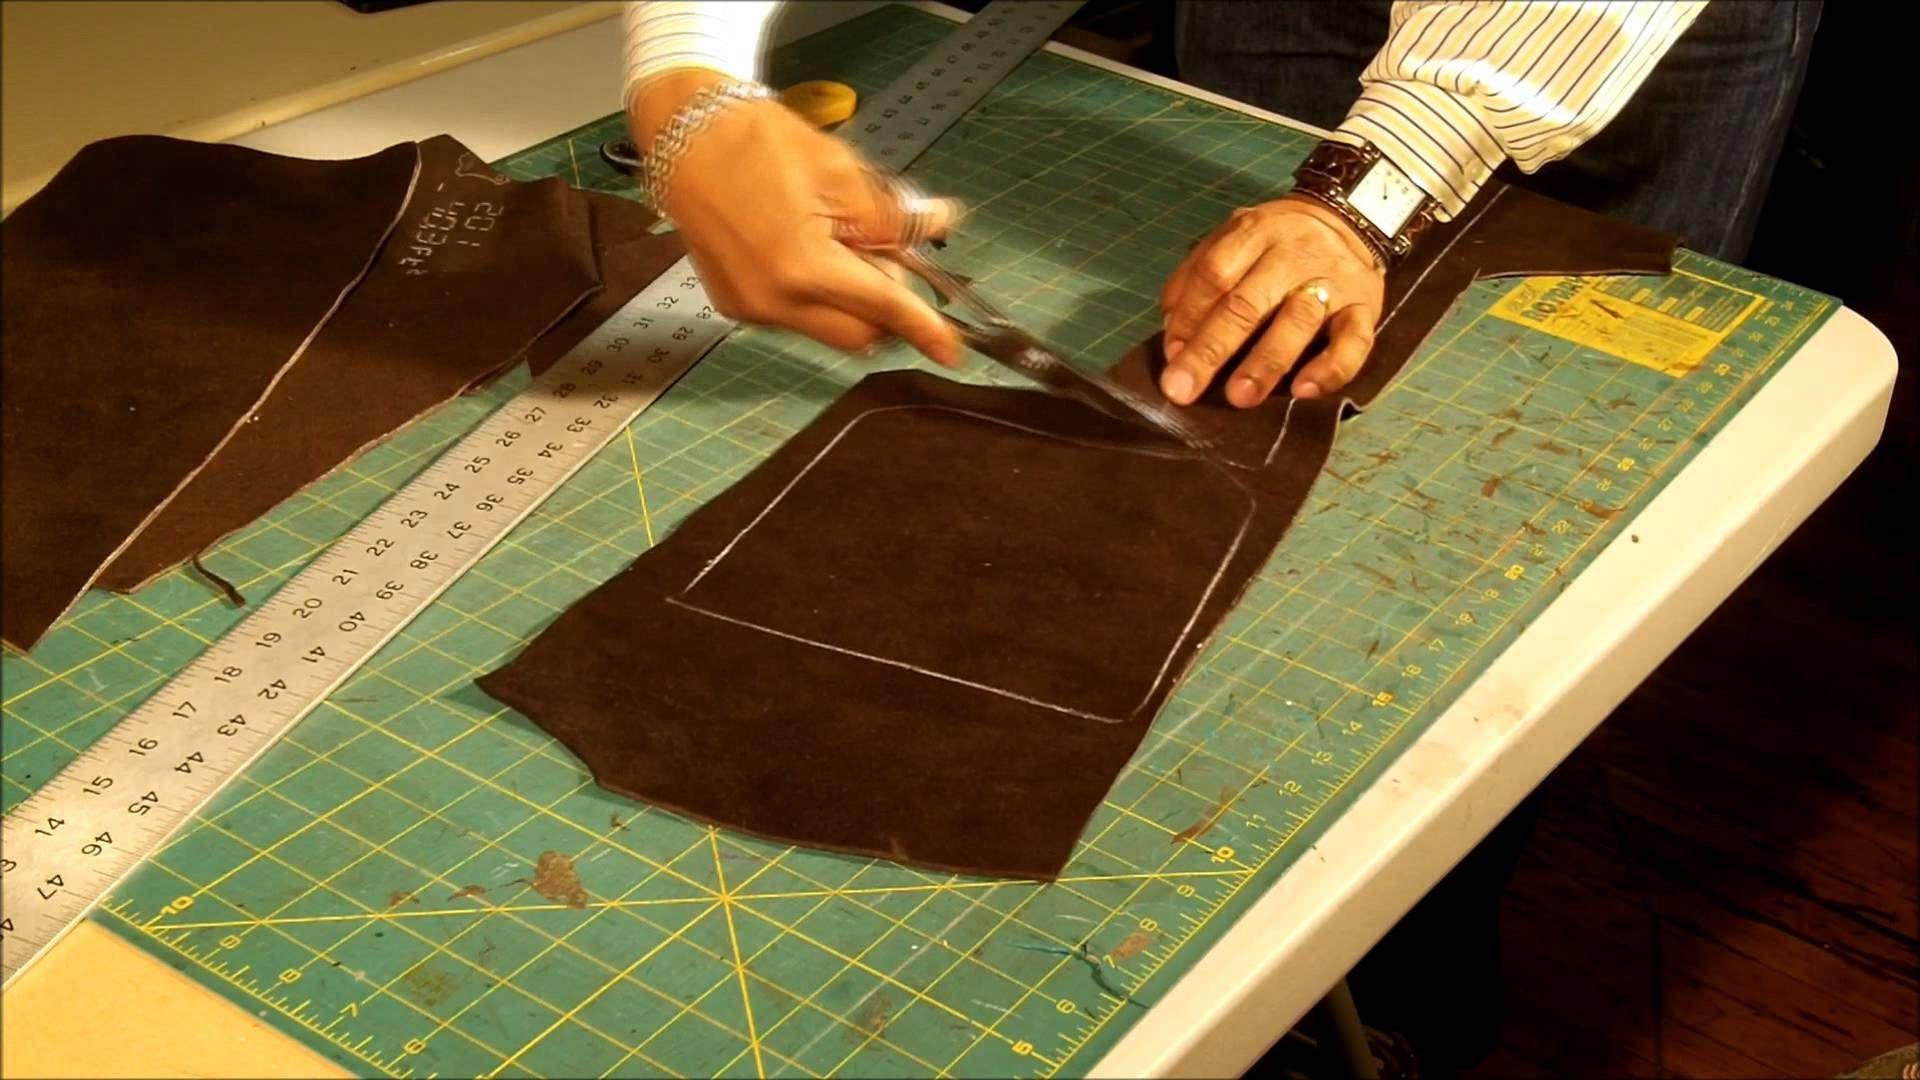 d524244d3ef7 How To Make a Leather Messenger Bag Part 2 of 7